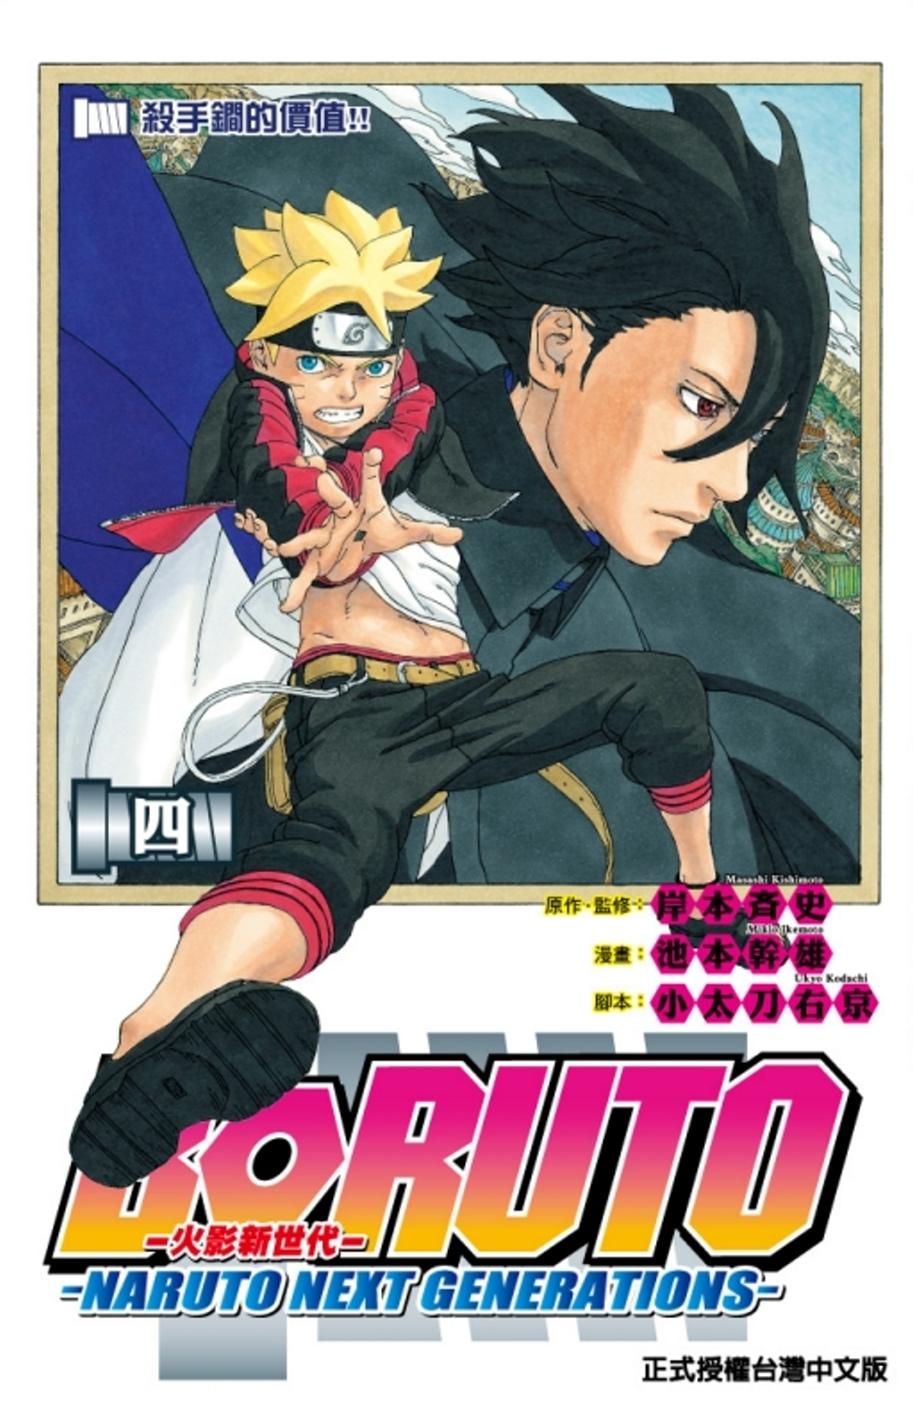 火影新世代BORUTO-NARUTO NEXT GENERATIONS- 4